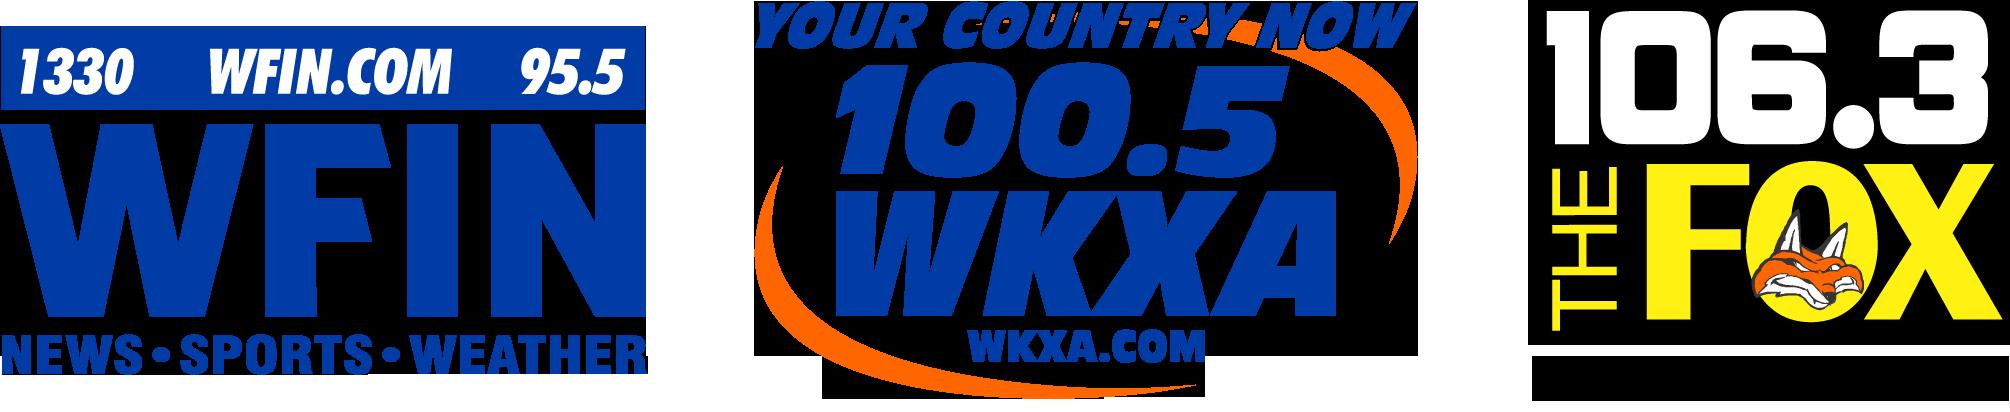 WFIN WKXA 1063 THE FOX Online Payment |